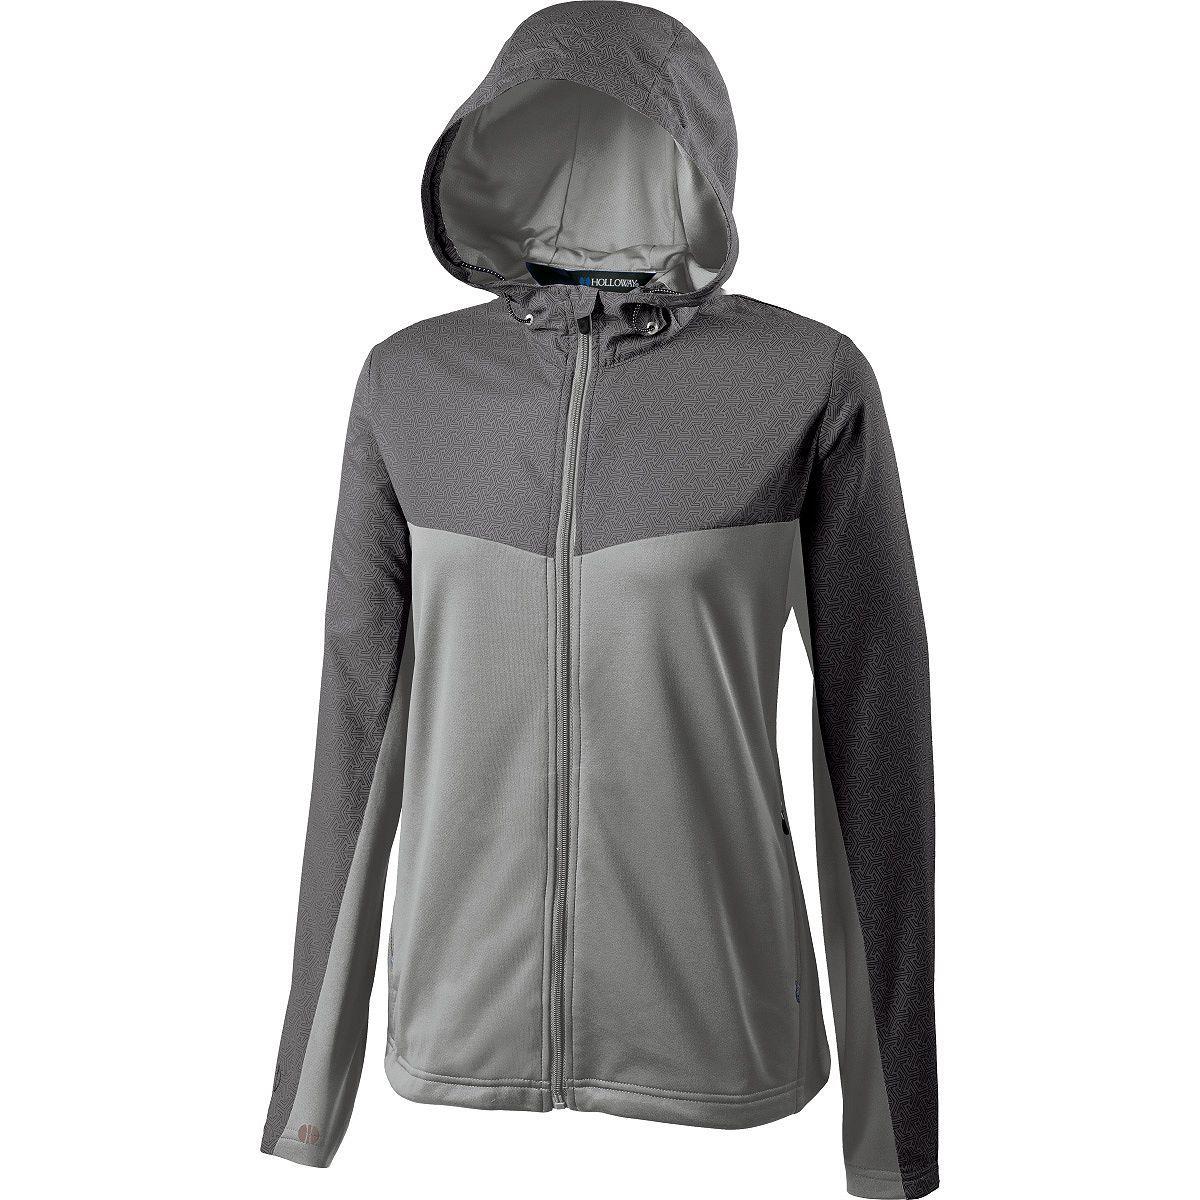 Ladies Crossover Jacket - GREY PRINT/GREY